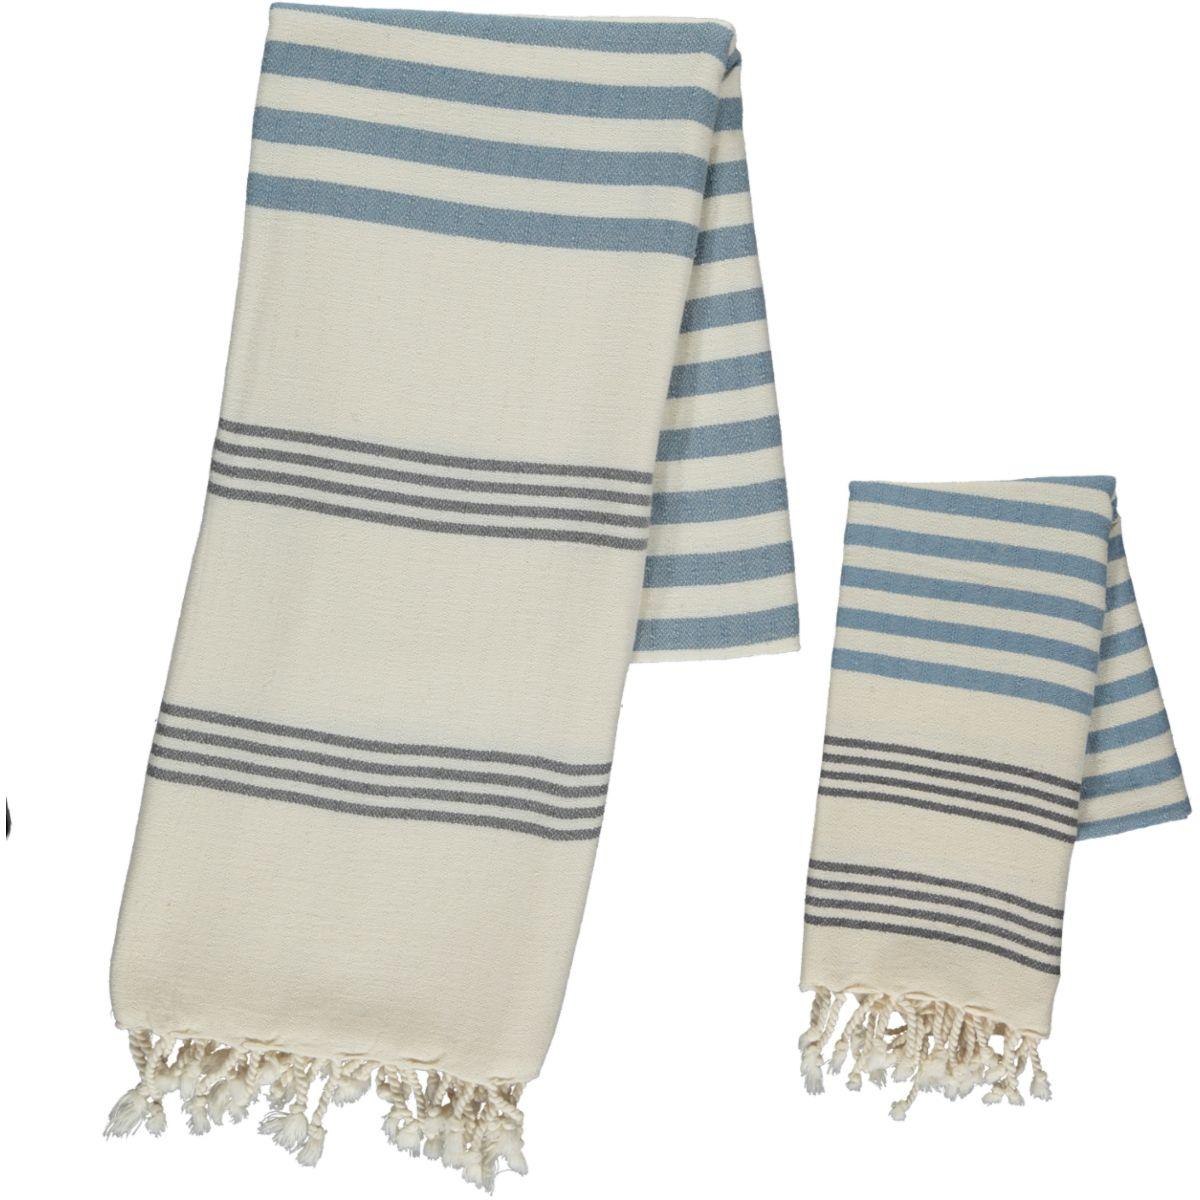 Peshtemal / Towel - Sultan FUN - Dark Grey / Air Blue